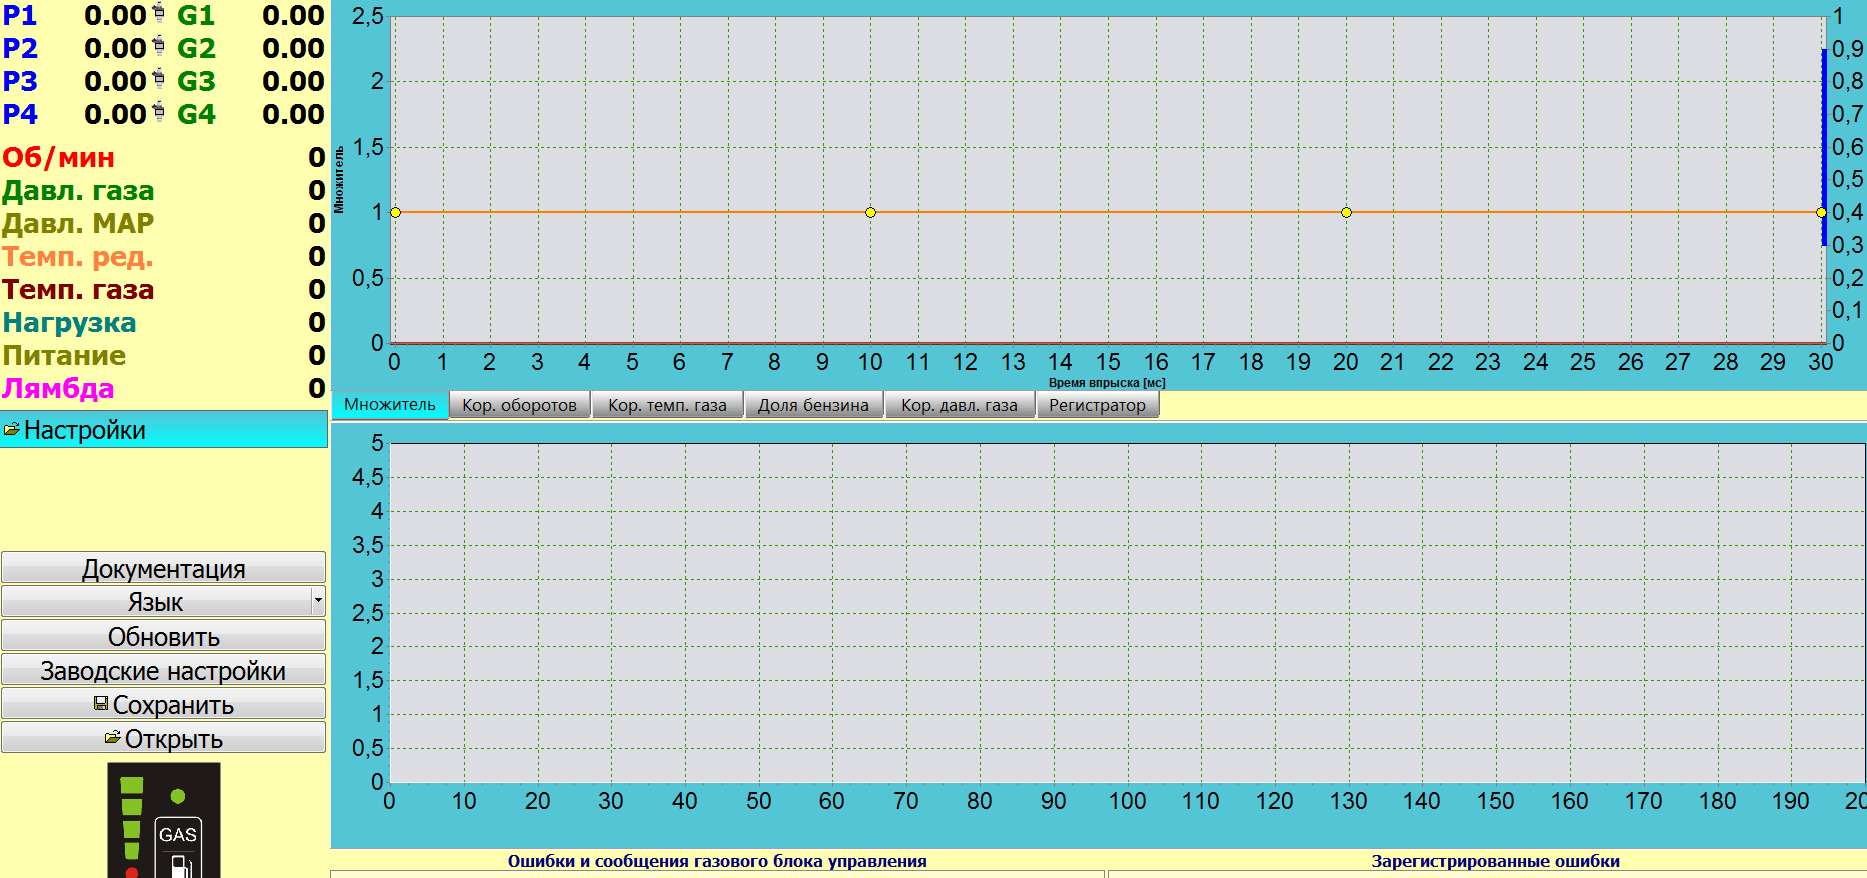 Digitronic maxi Главное окно